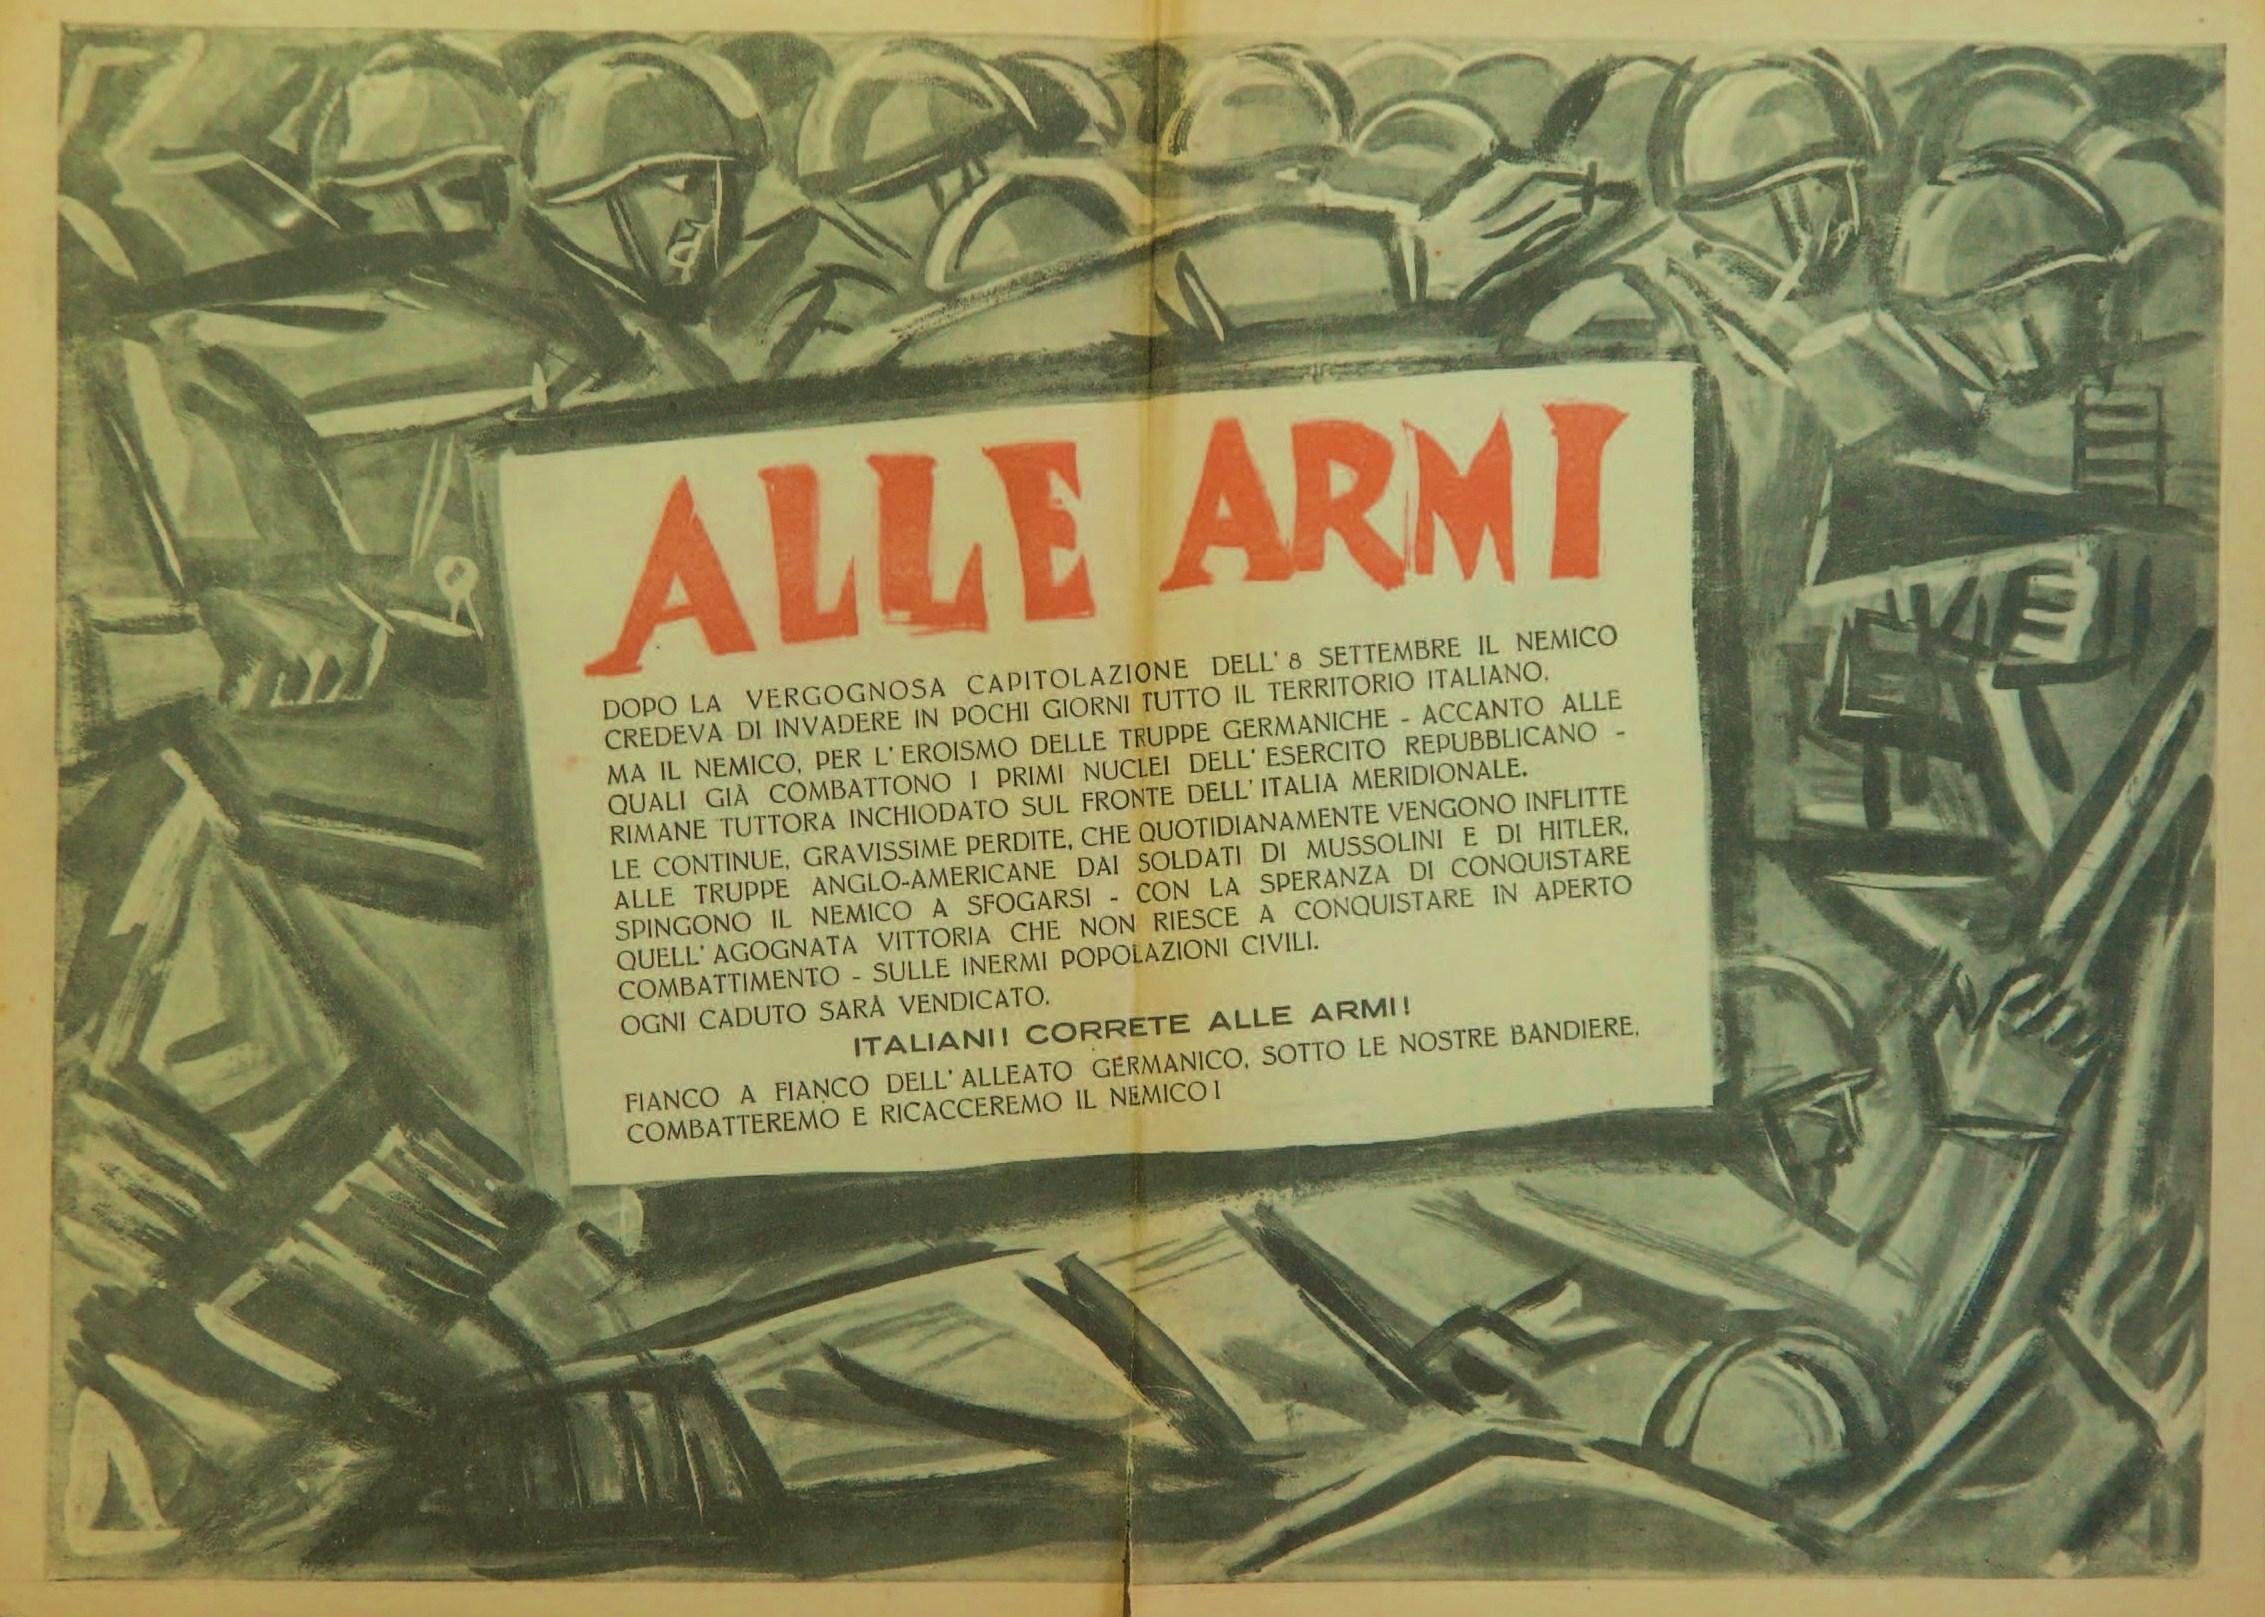 DECIMA FLOTTIGLIA M.A.S.: propaganda per la riscossa (IX parte) – Gianluca Padovan